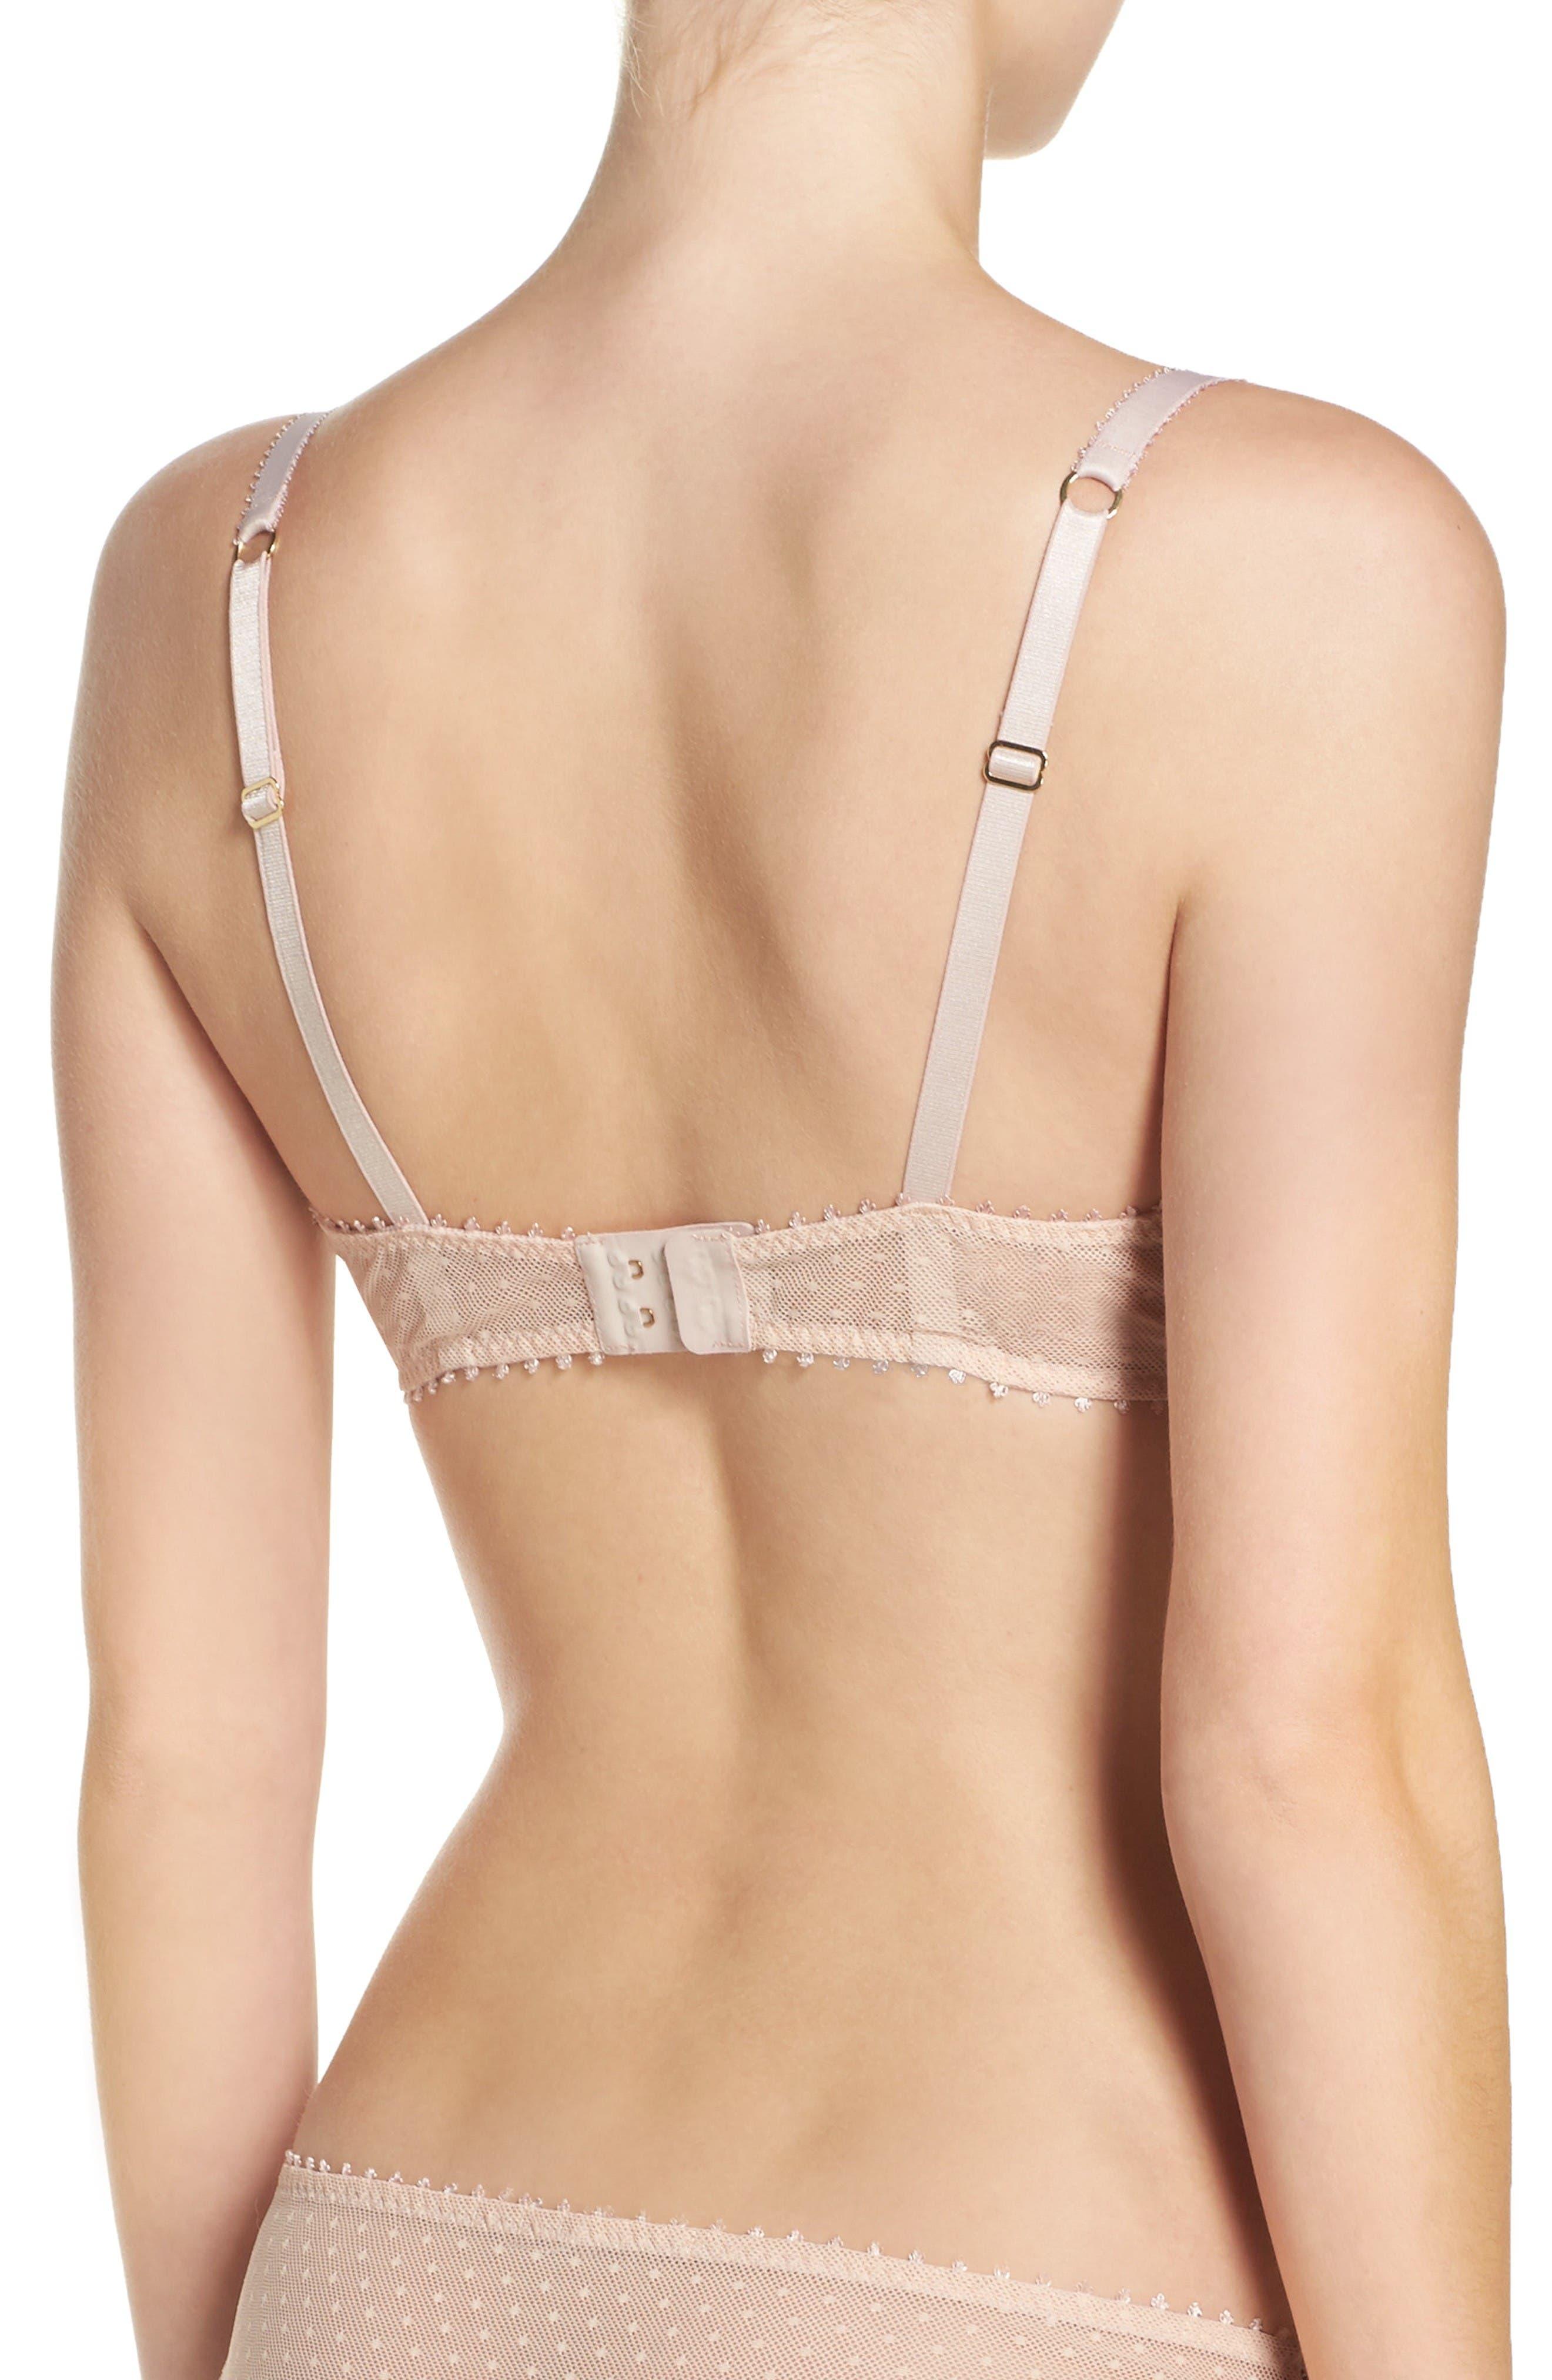 Alternate Image 2  - Stella McCartney 'Rachel Shopping' Underwire Balconette Bra